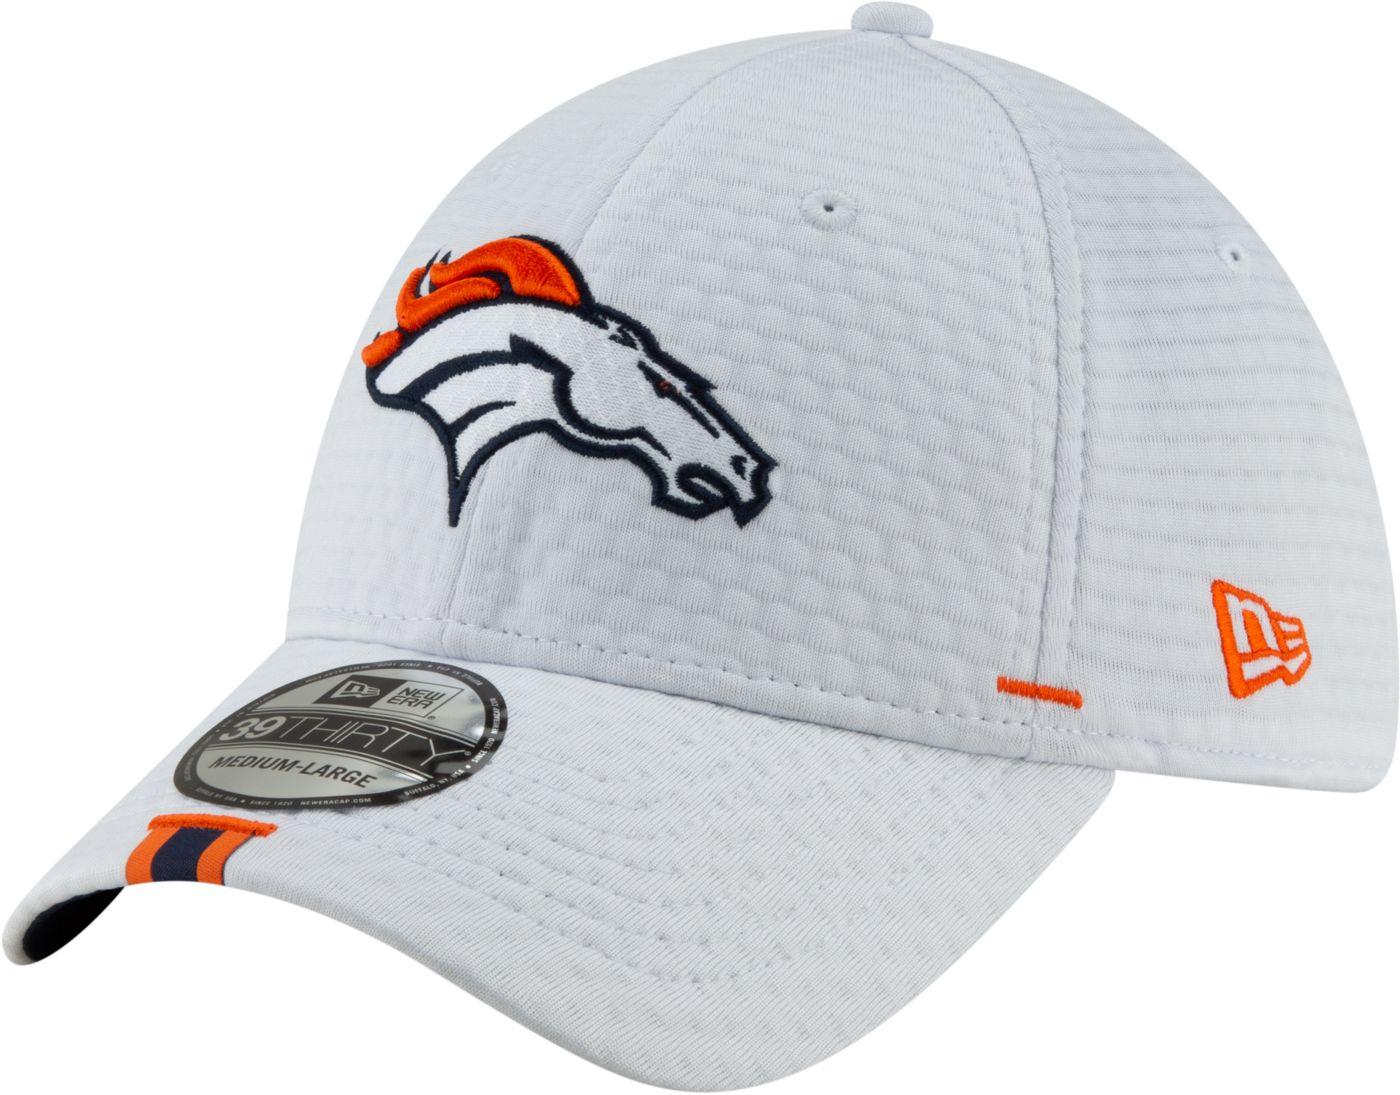 New Era Men's Denver Broncos Sideline Training Camp 39Thirty Stretch Fit White Hat